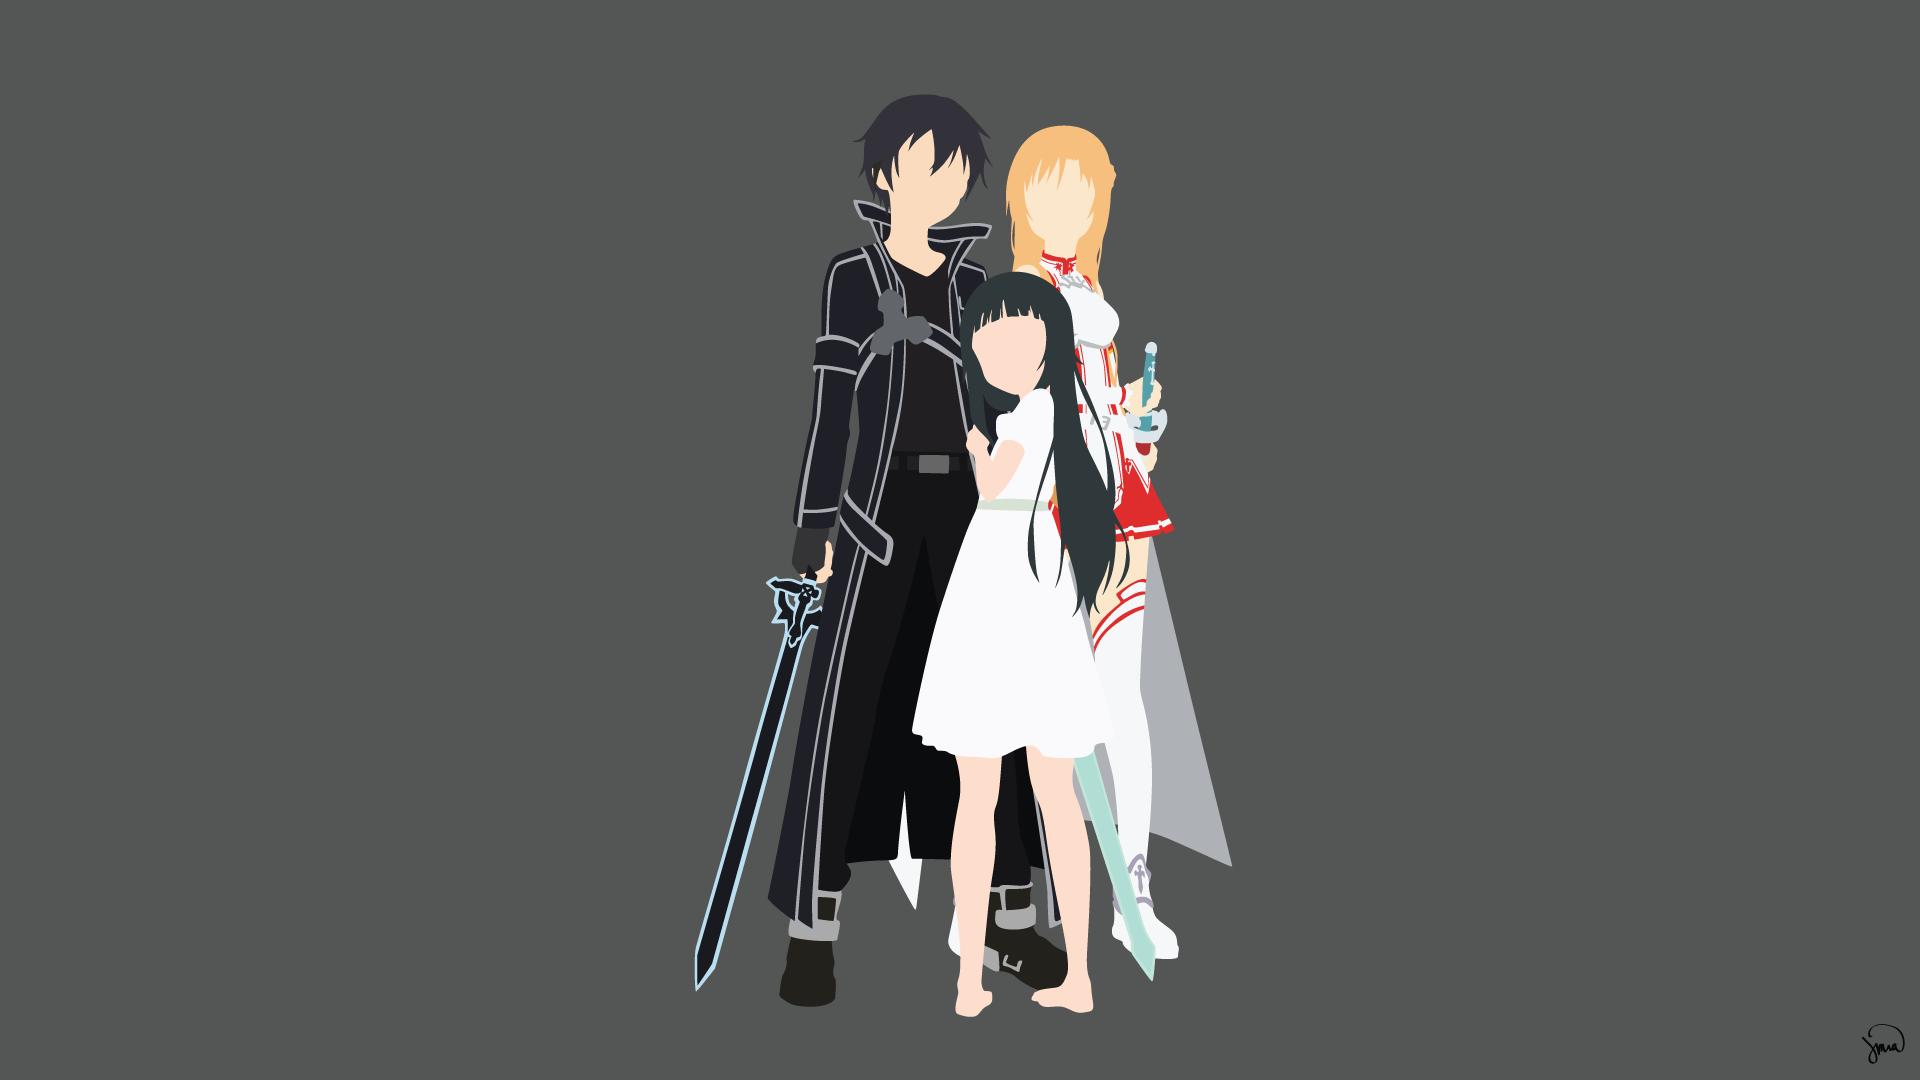 Kirito asuna and yui full hd fondo de pantalla and fondo for Minimal art online